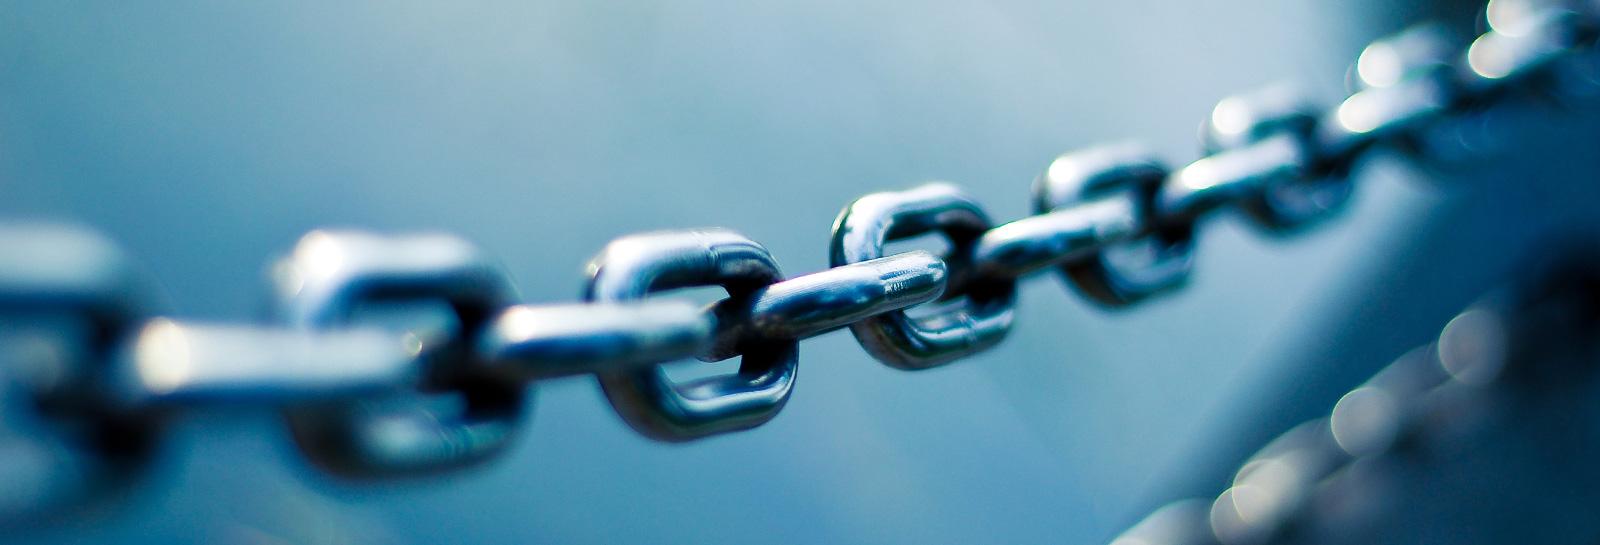 a closeup shot of a metal chain